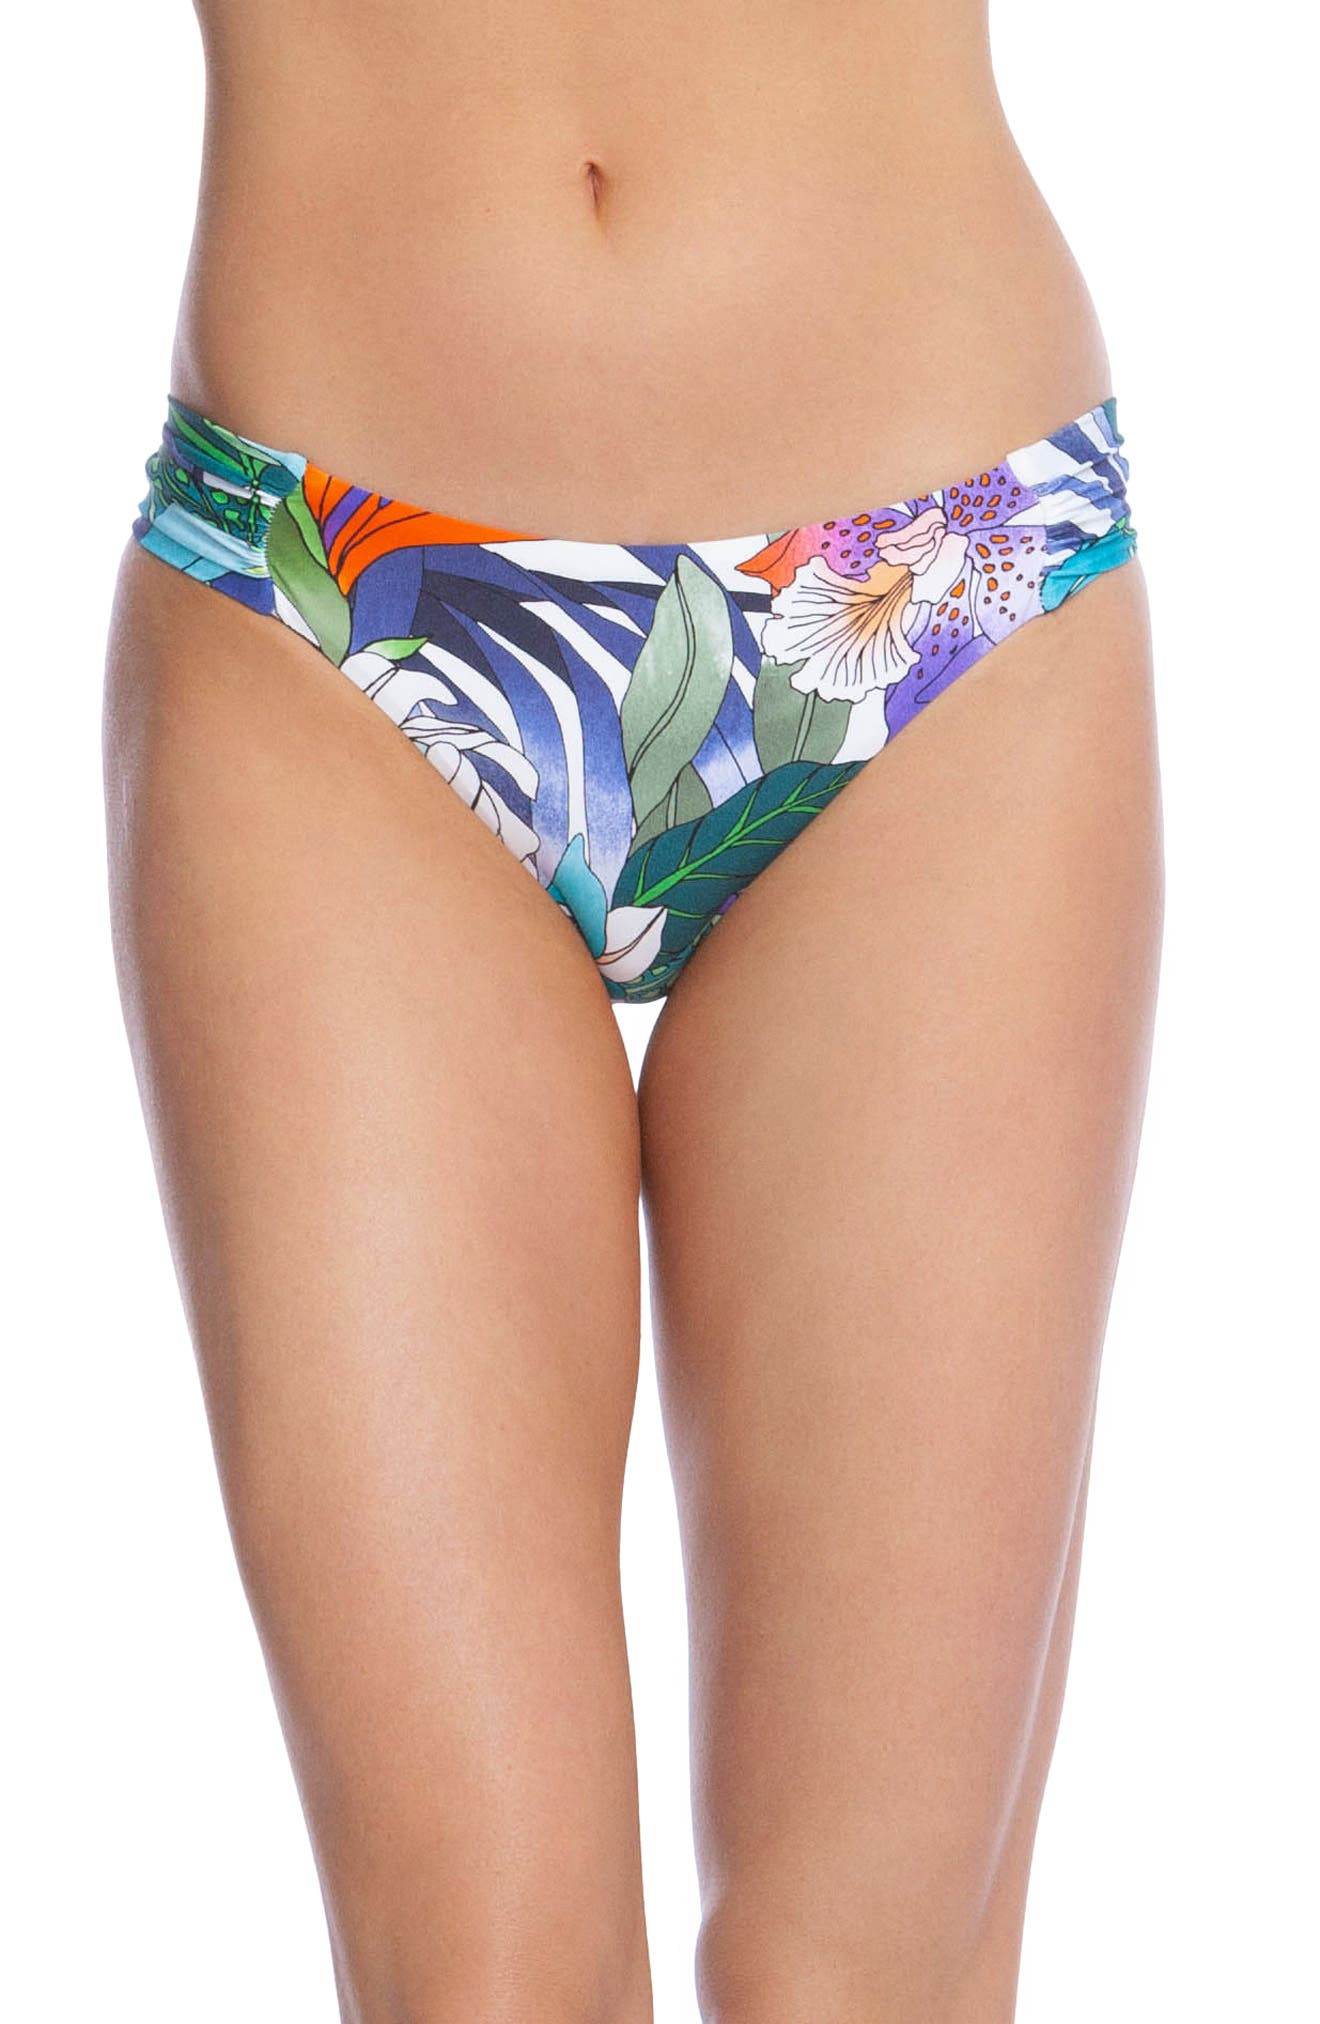 Trina Turk Amazonia Hipster Bikini Bottoms, White